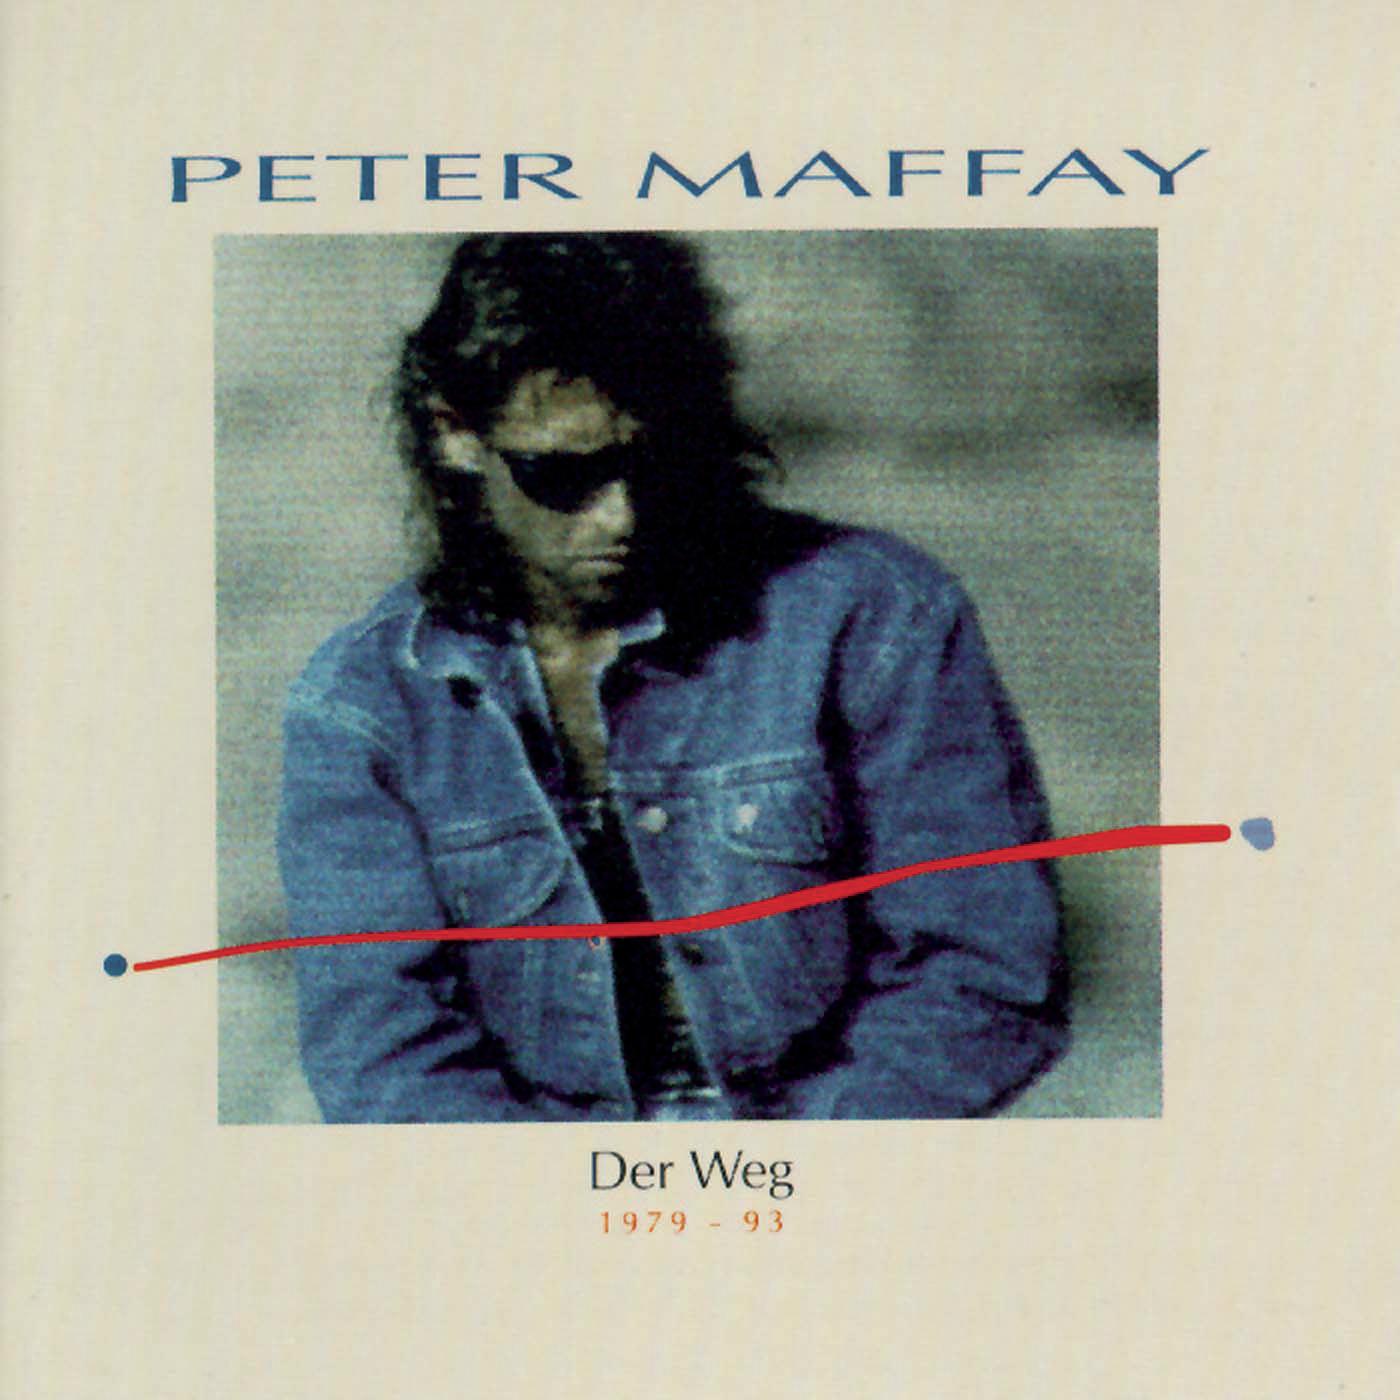 Der Weg 1979-1993 - Peter Maffay